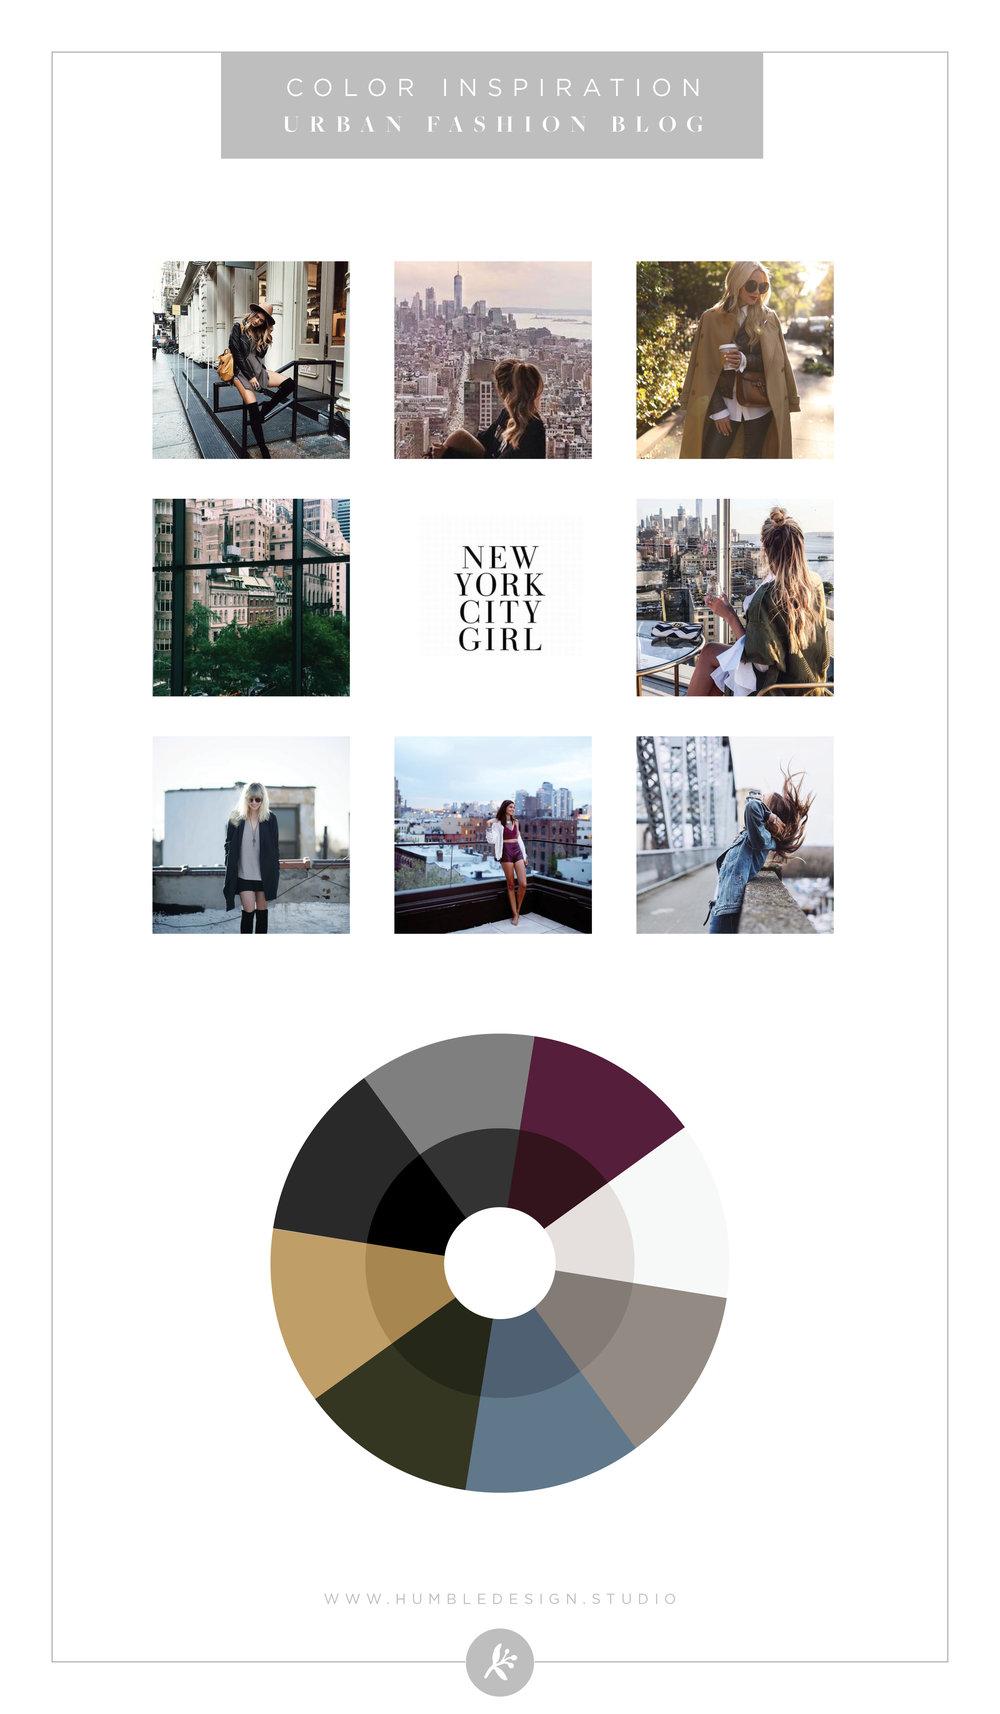 Urban fashion blog color inspiration